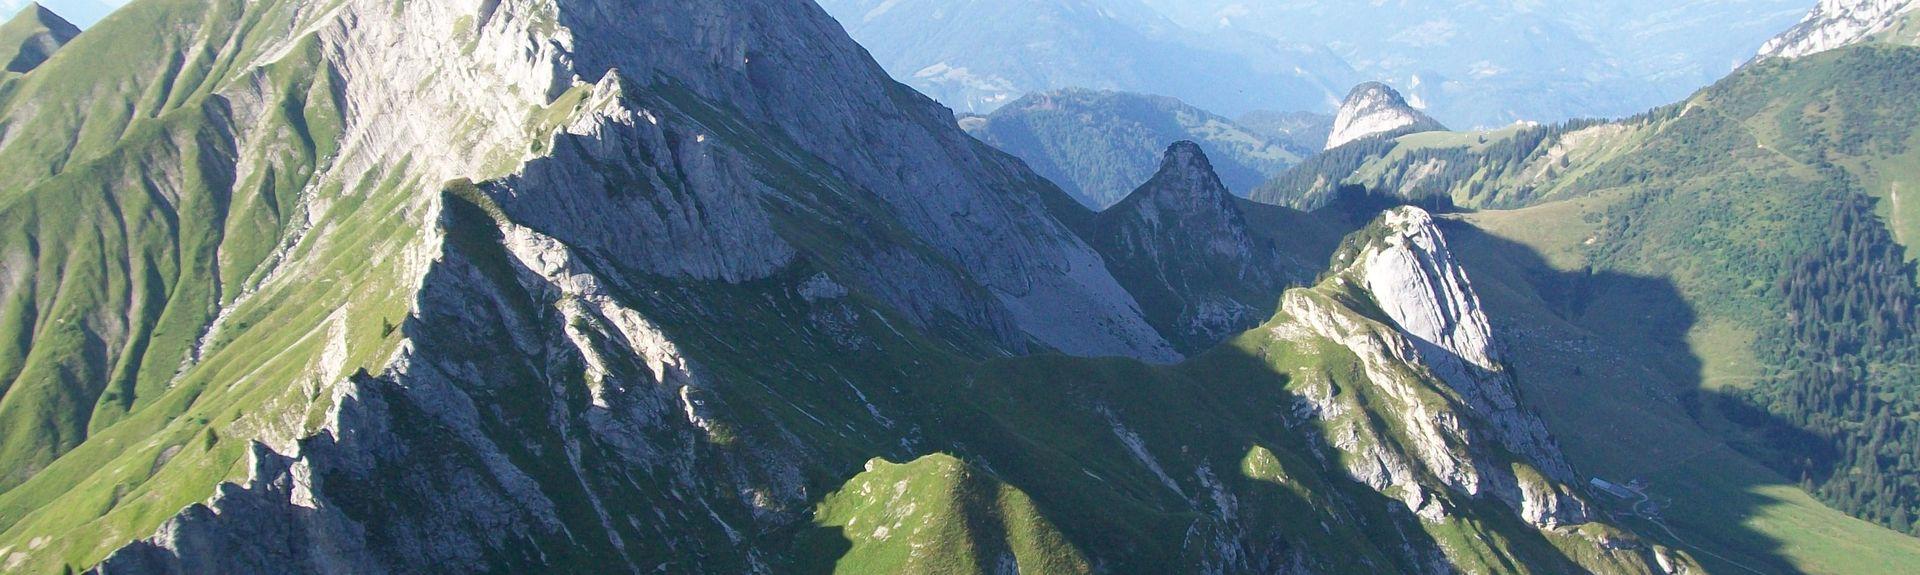 Faverges-Seythenex, Auvergne-Rhône-Alpes, Frankrike